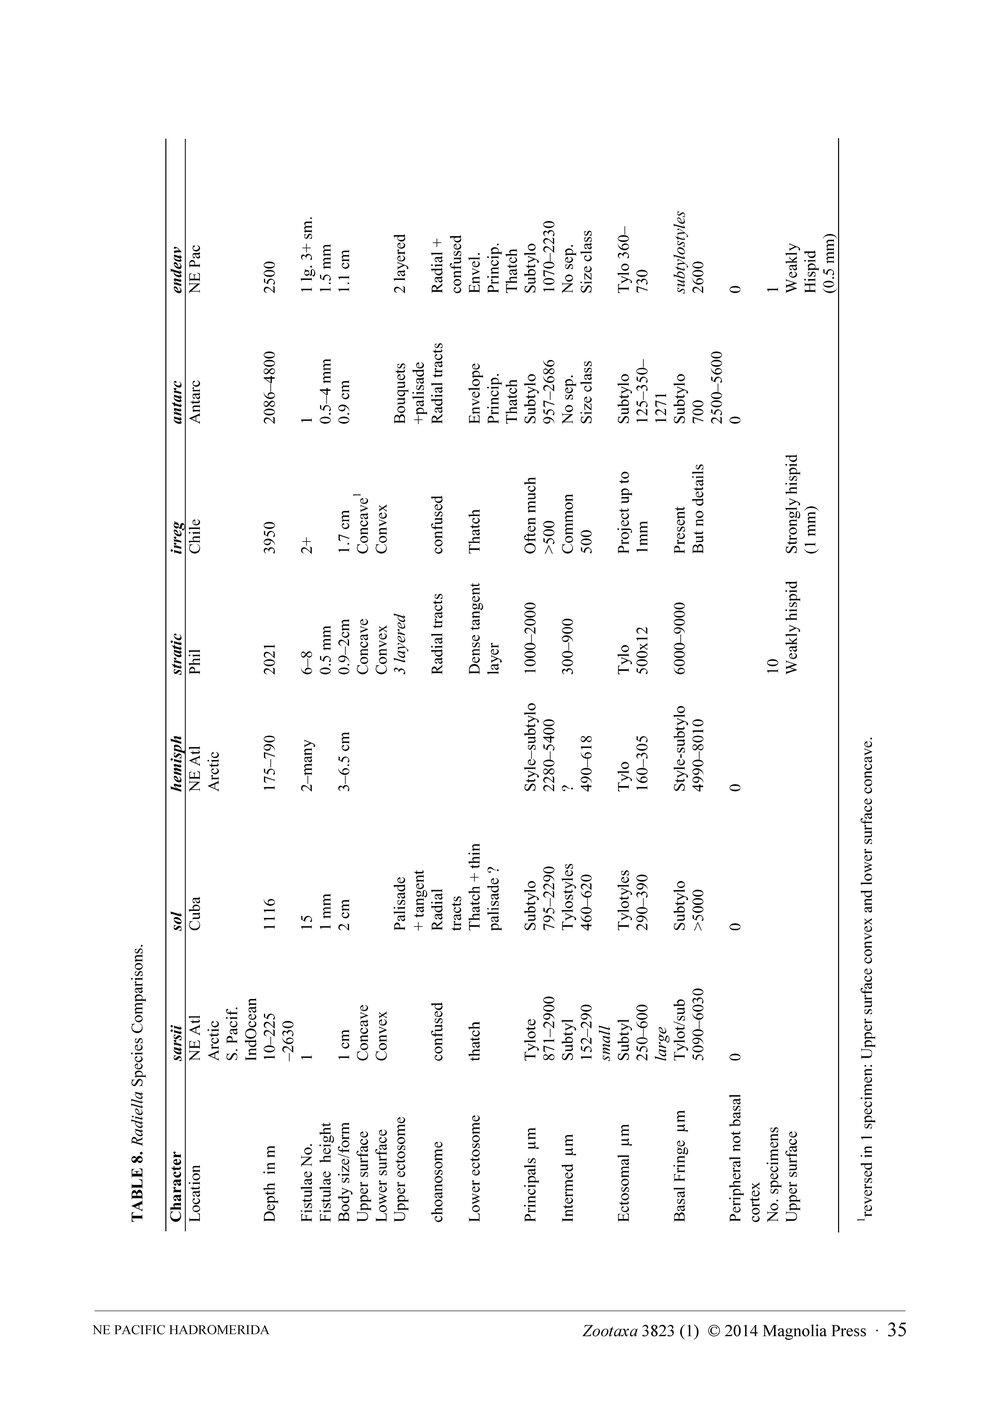 Austin et al 2014 NE Pacific Hadromerids_Page_35.jpg